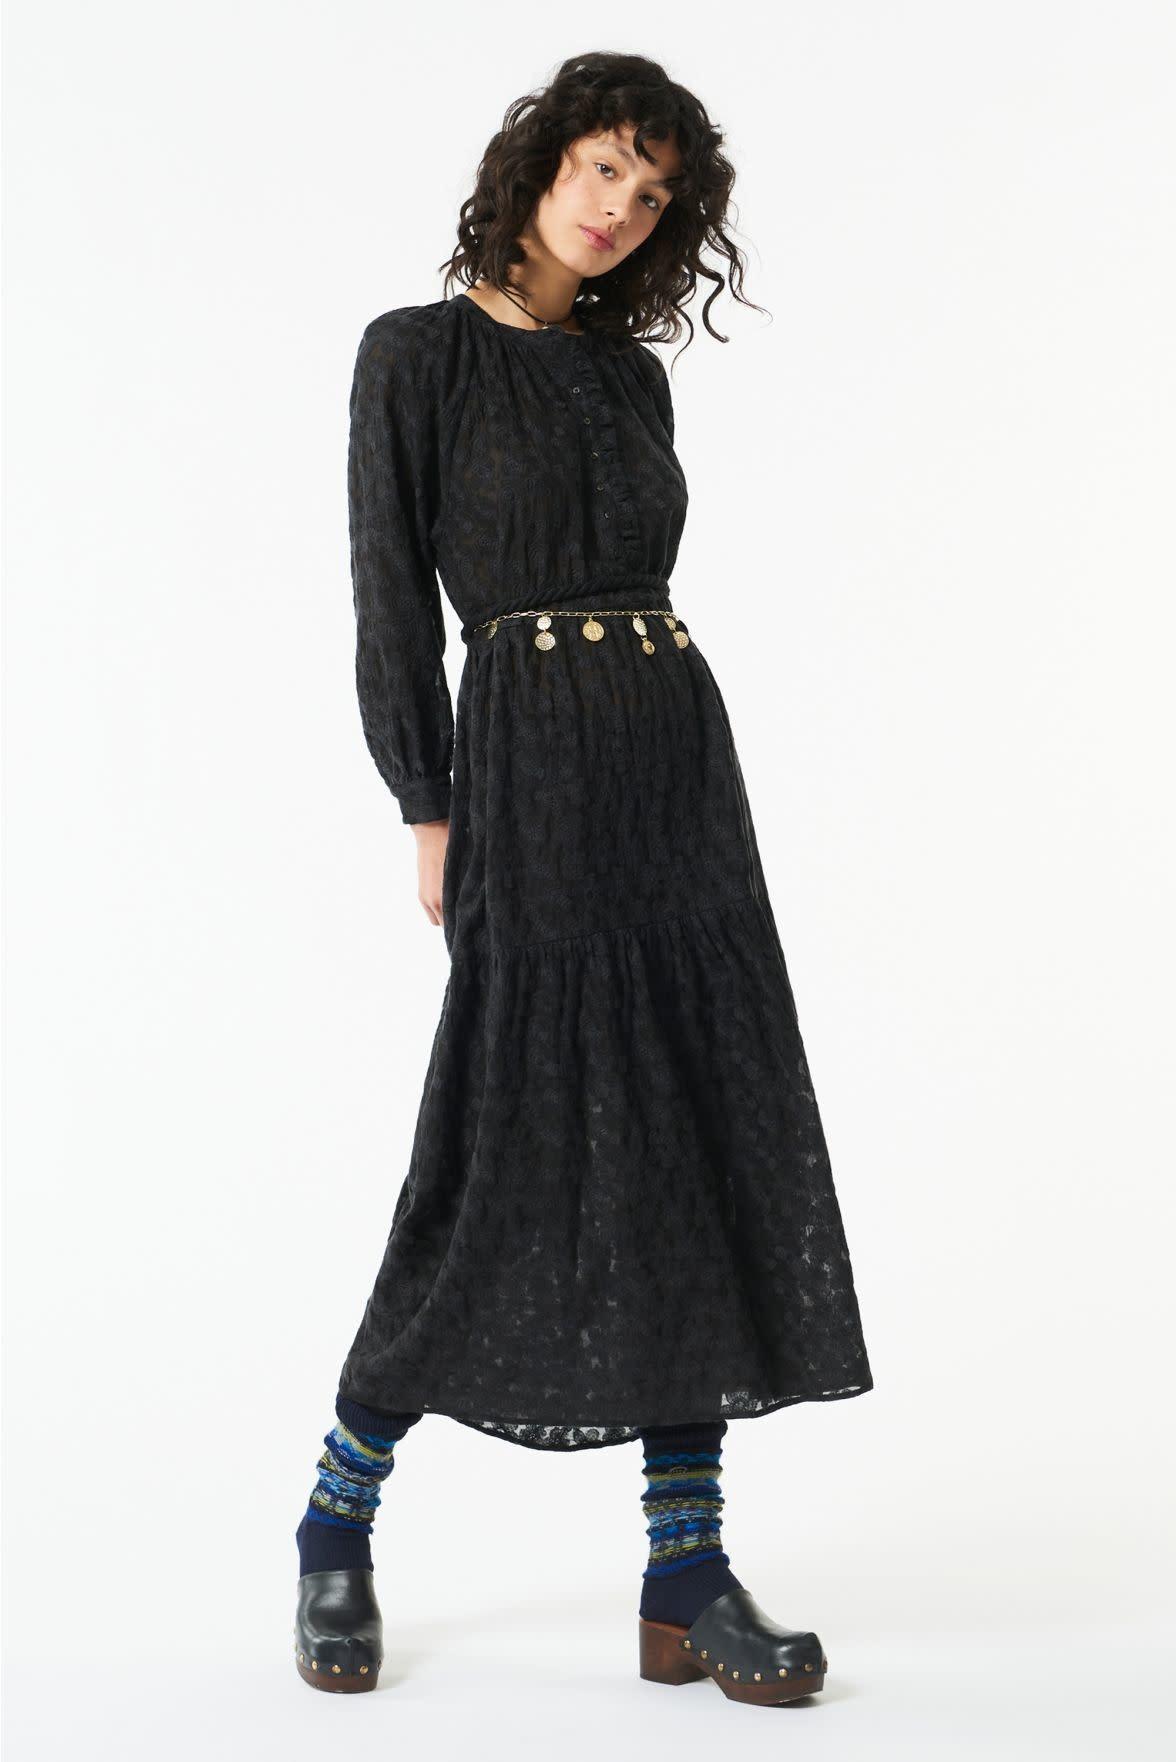 till black dress flower-1